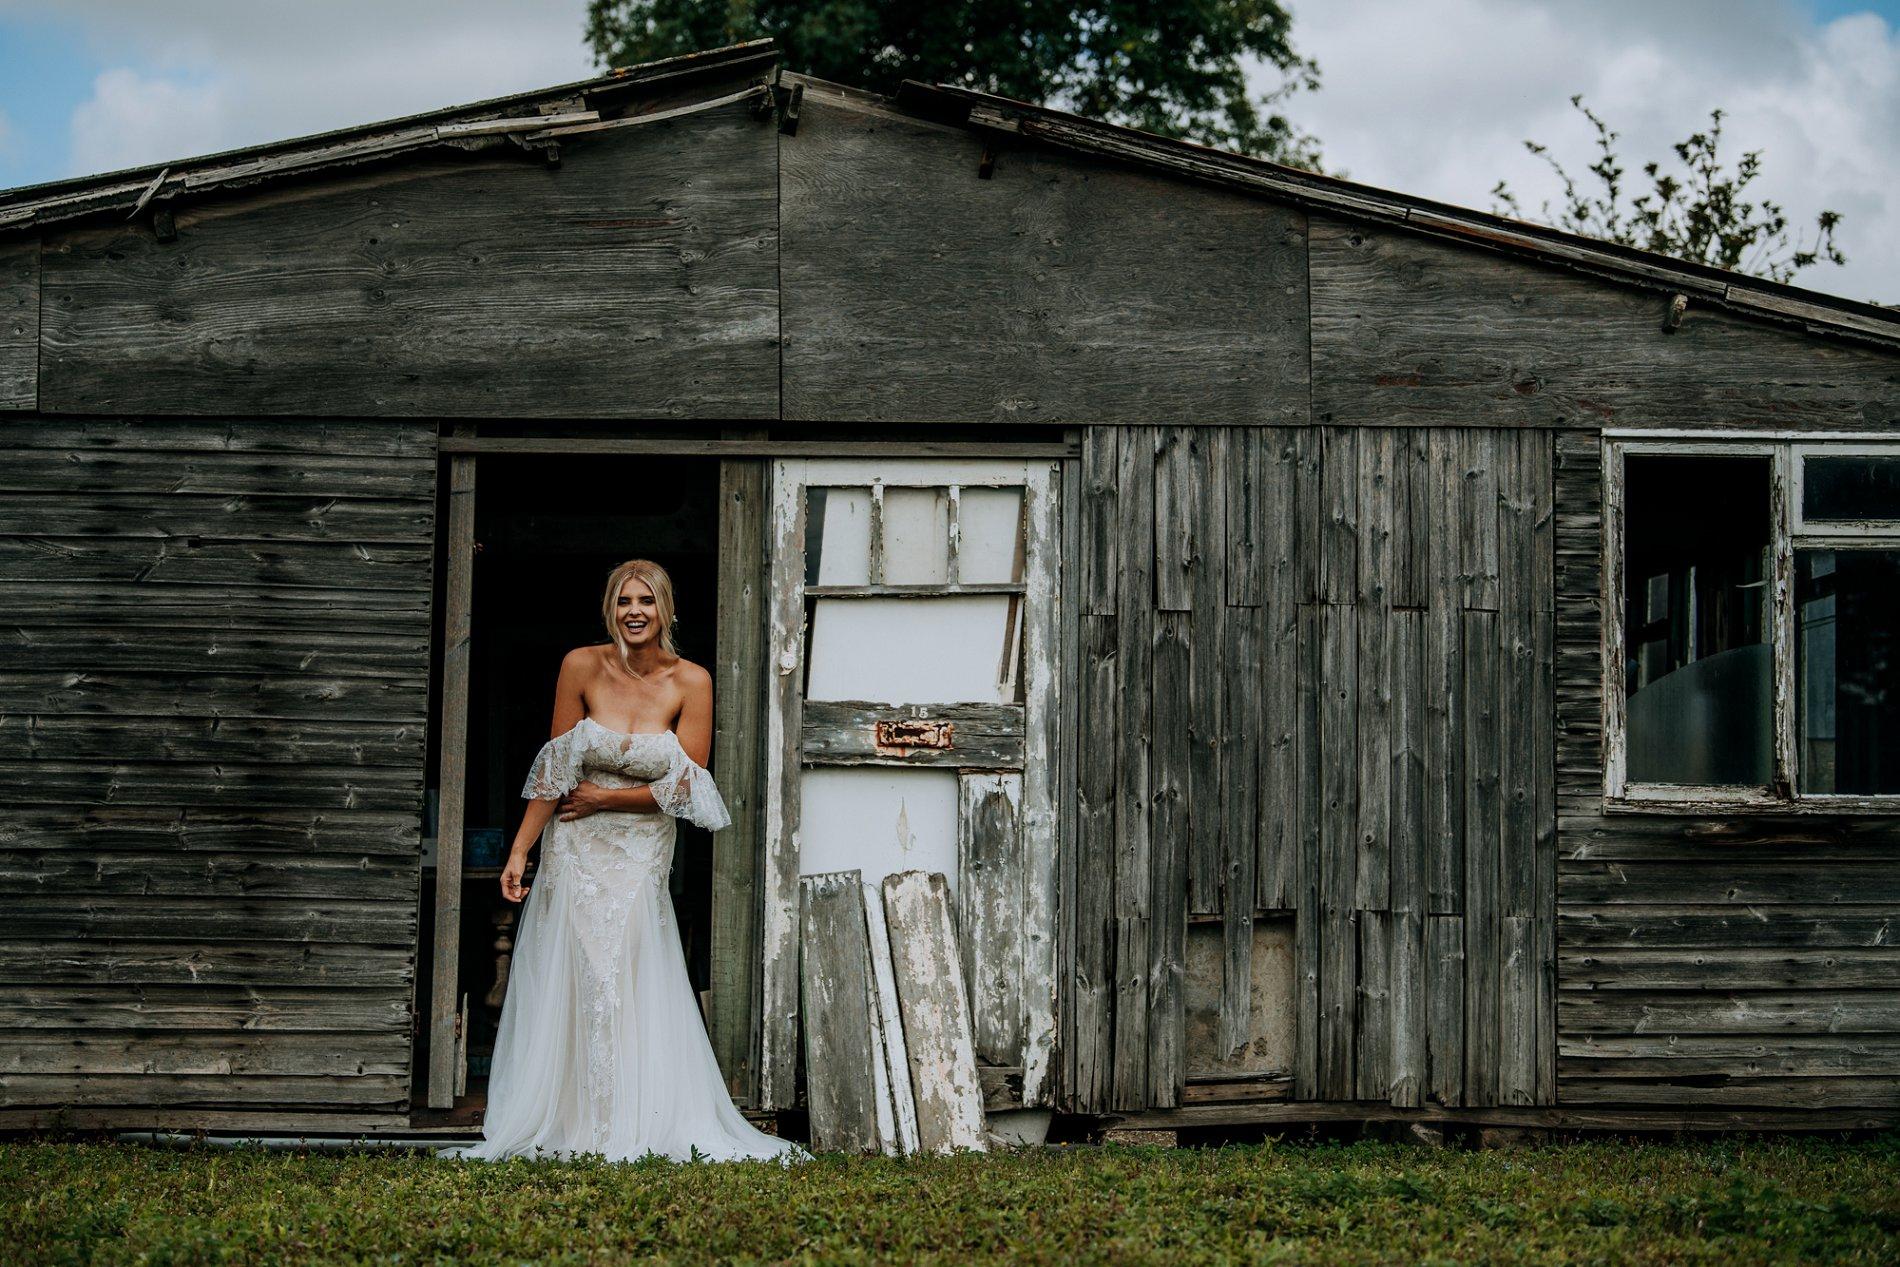 A Creative Elizabeth Lucas Bridal Fashion Editorial in Yorkshire (c) M and G Wedding Photography (14)